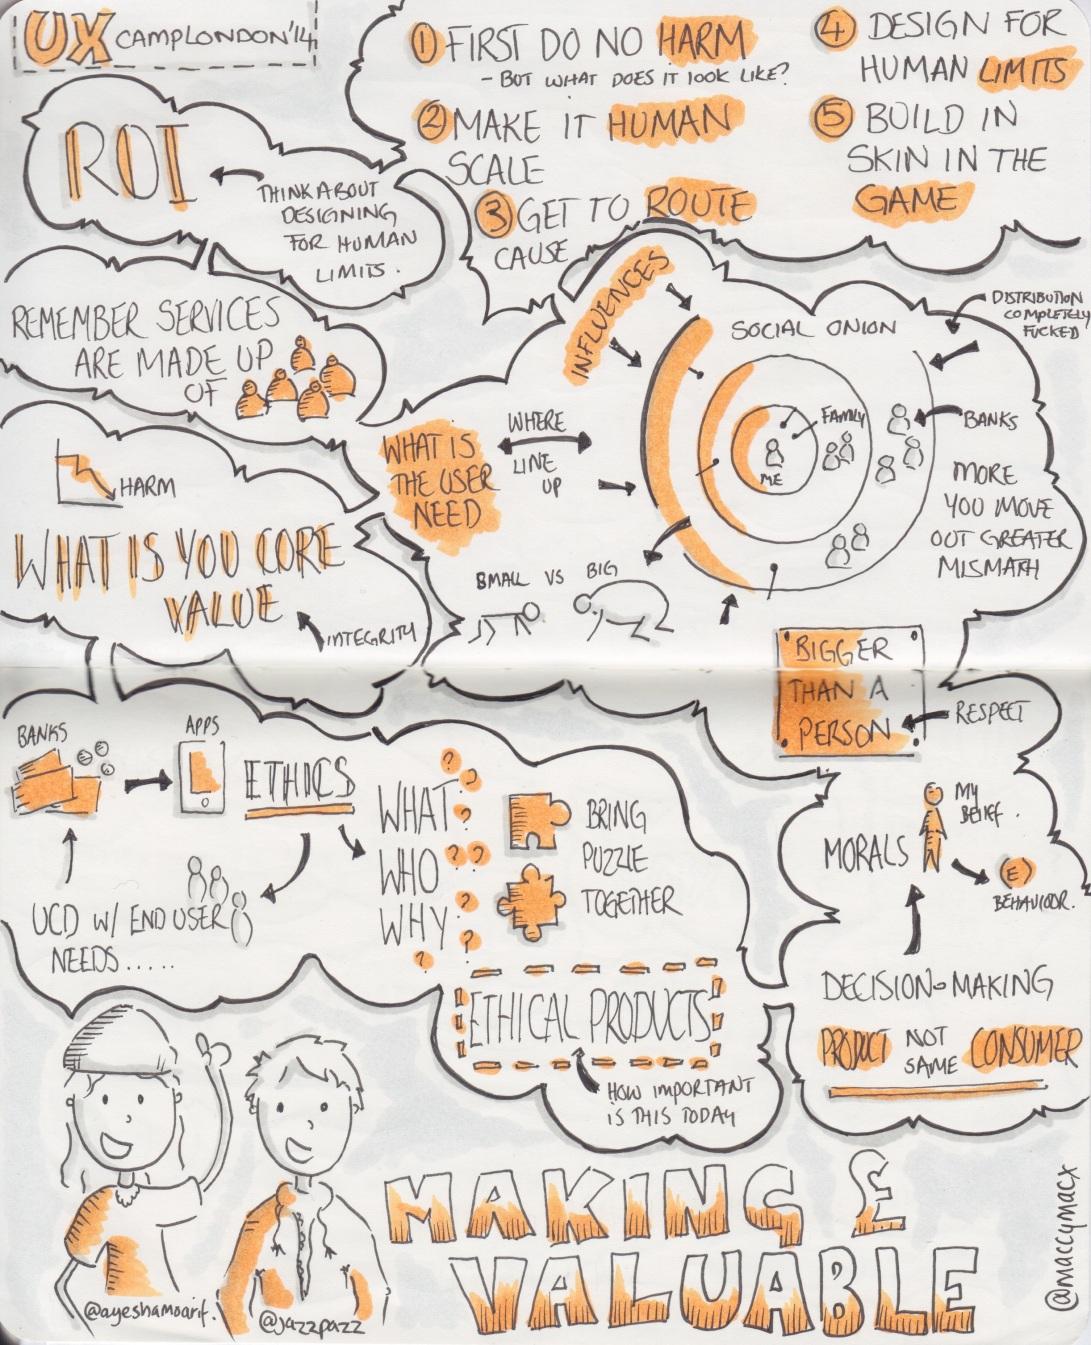 "Sketchnotes ""Making Money Valuable"" talk by @ayeshamoarif @jazzpazz - UX Camp London, 22 March 2014 (Drawn by Makayla Lewis)"